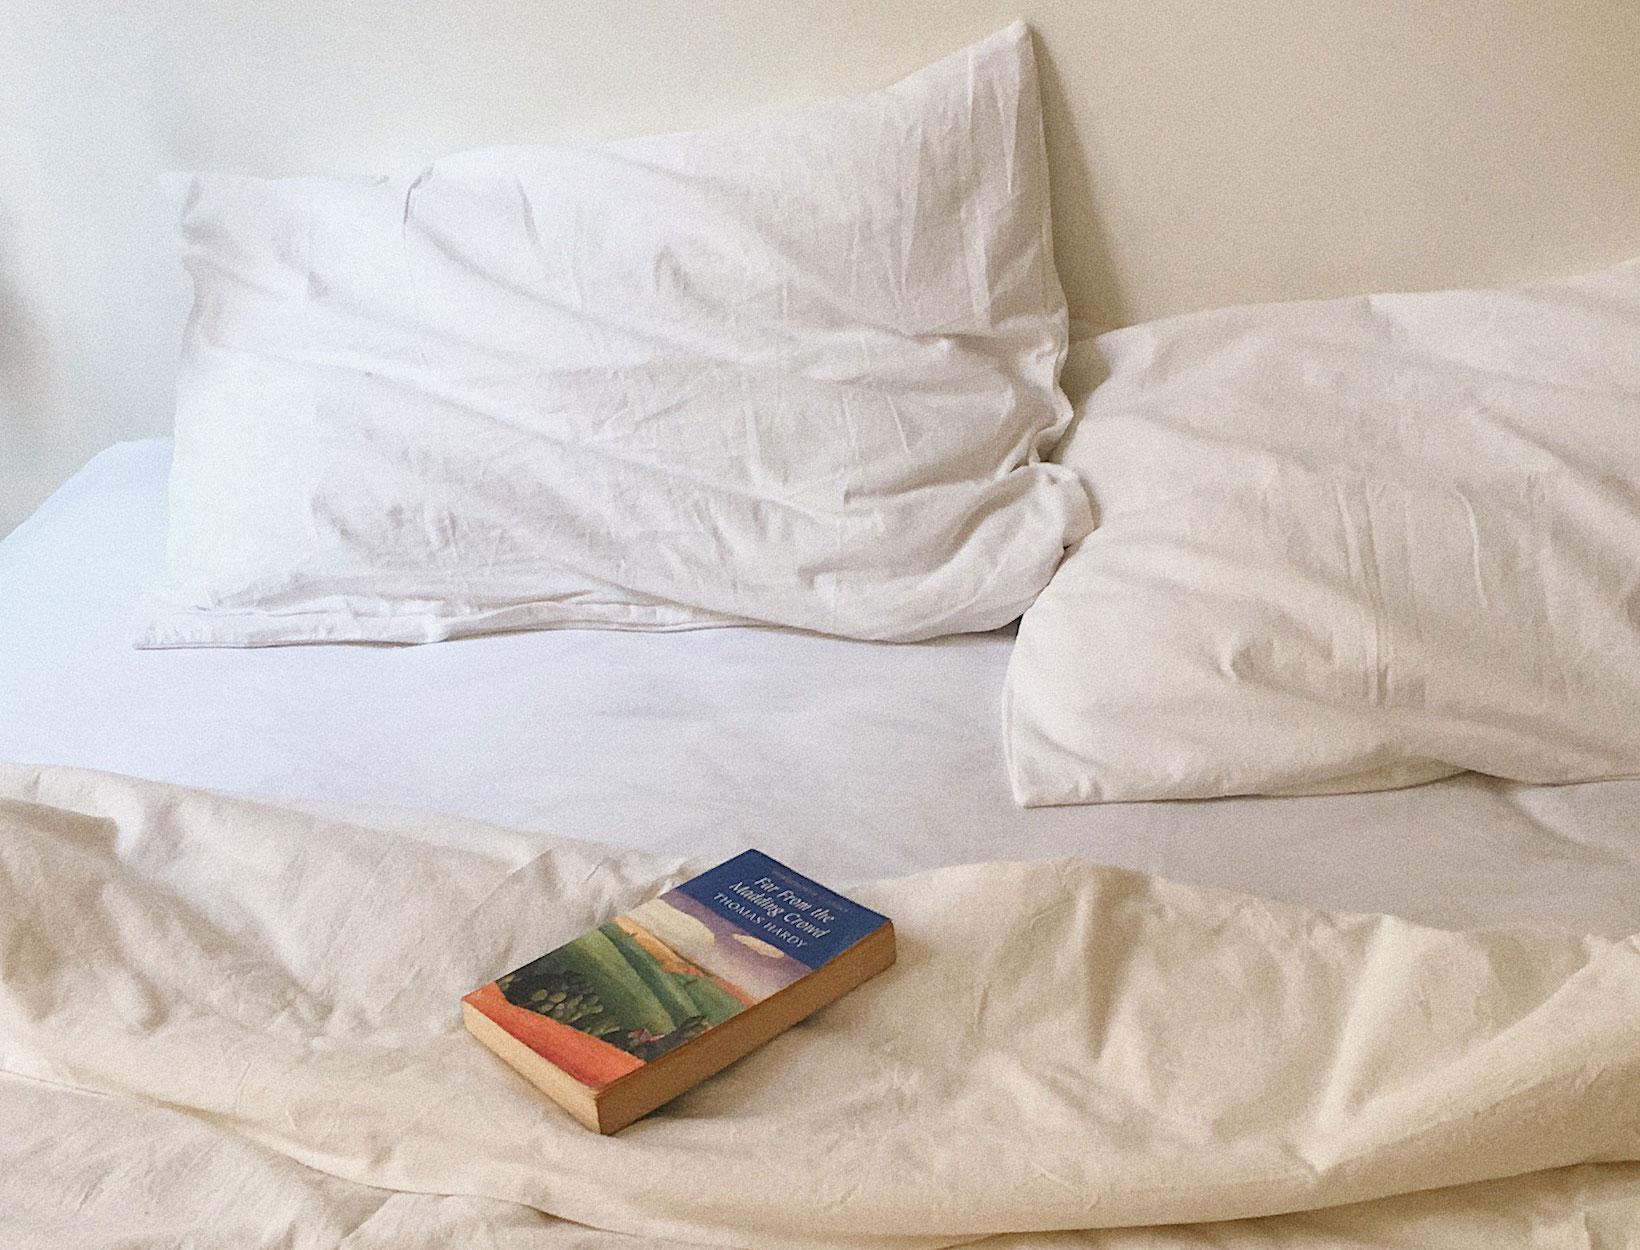 List Detox your bookshelf konmari